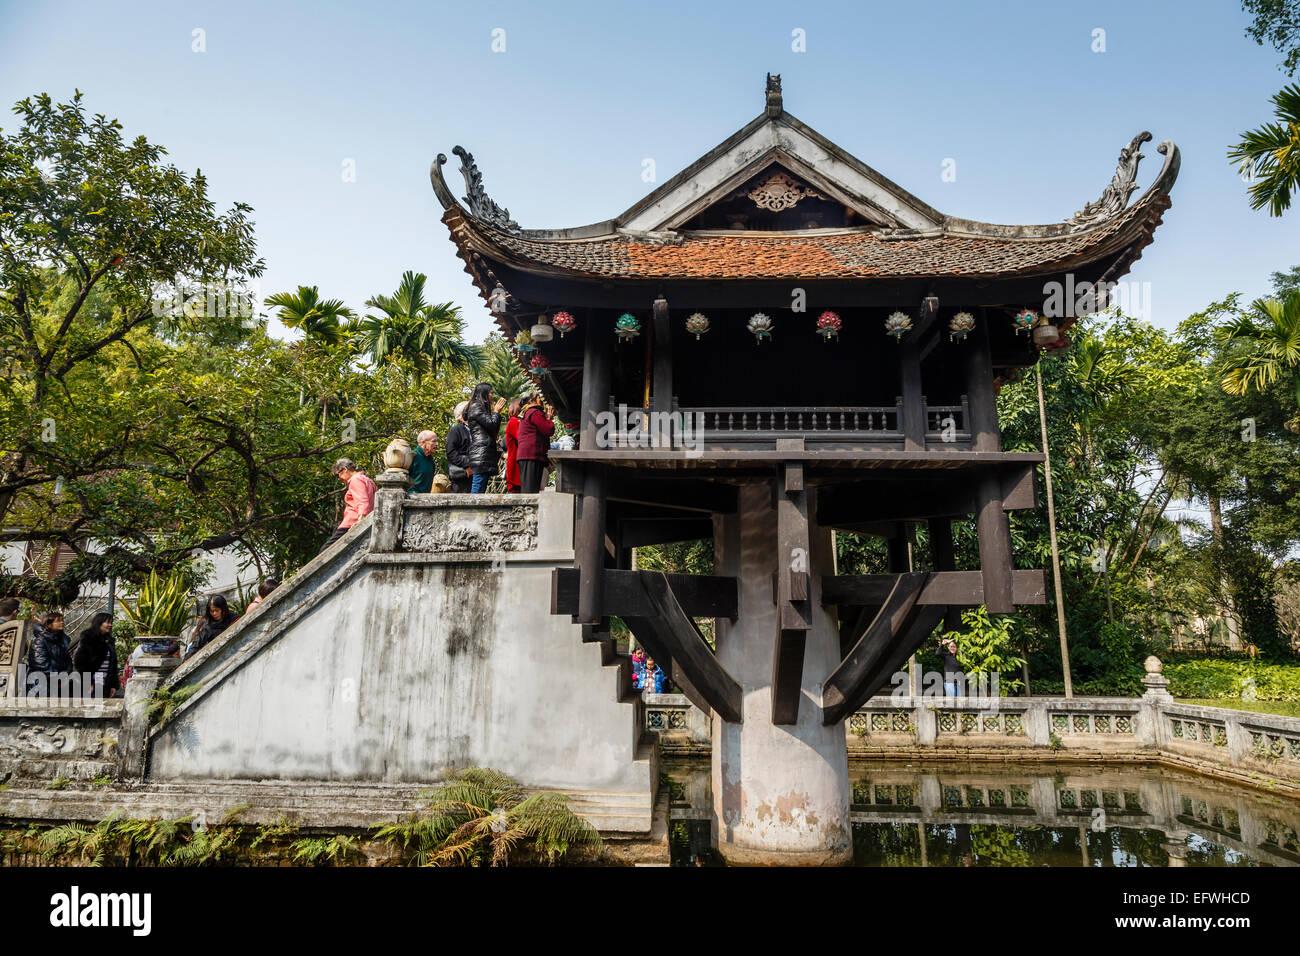 One Pillar Pagoda (Chua Mot Cot), Hanoi, Vietnam. Stock Photo